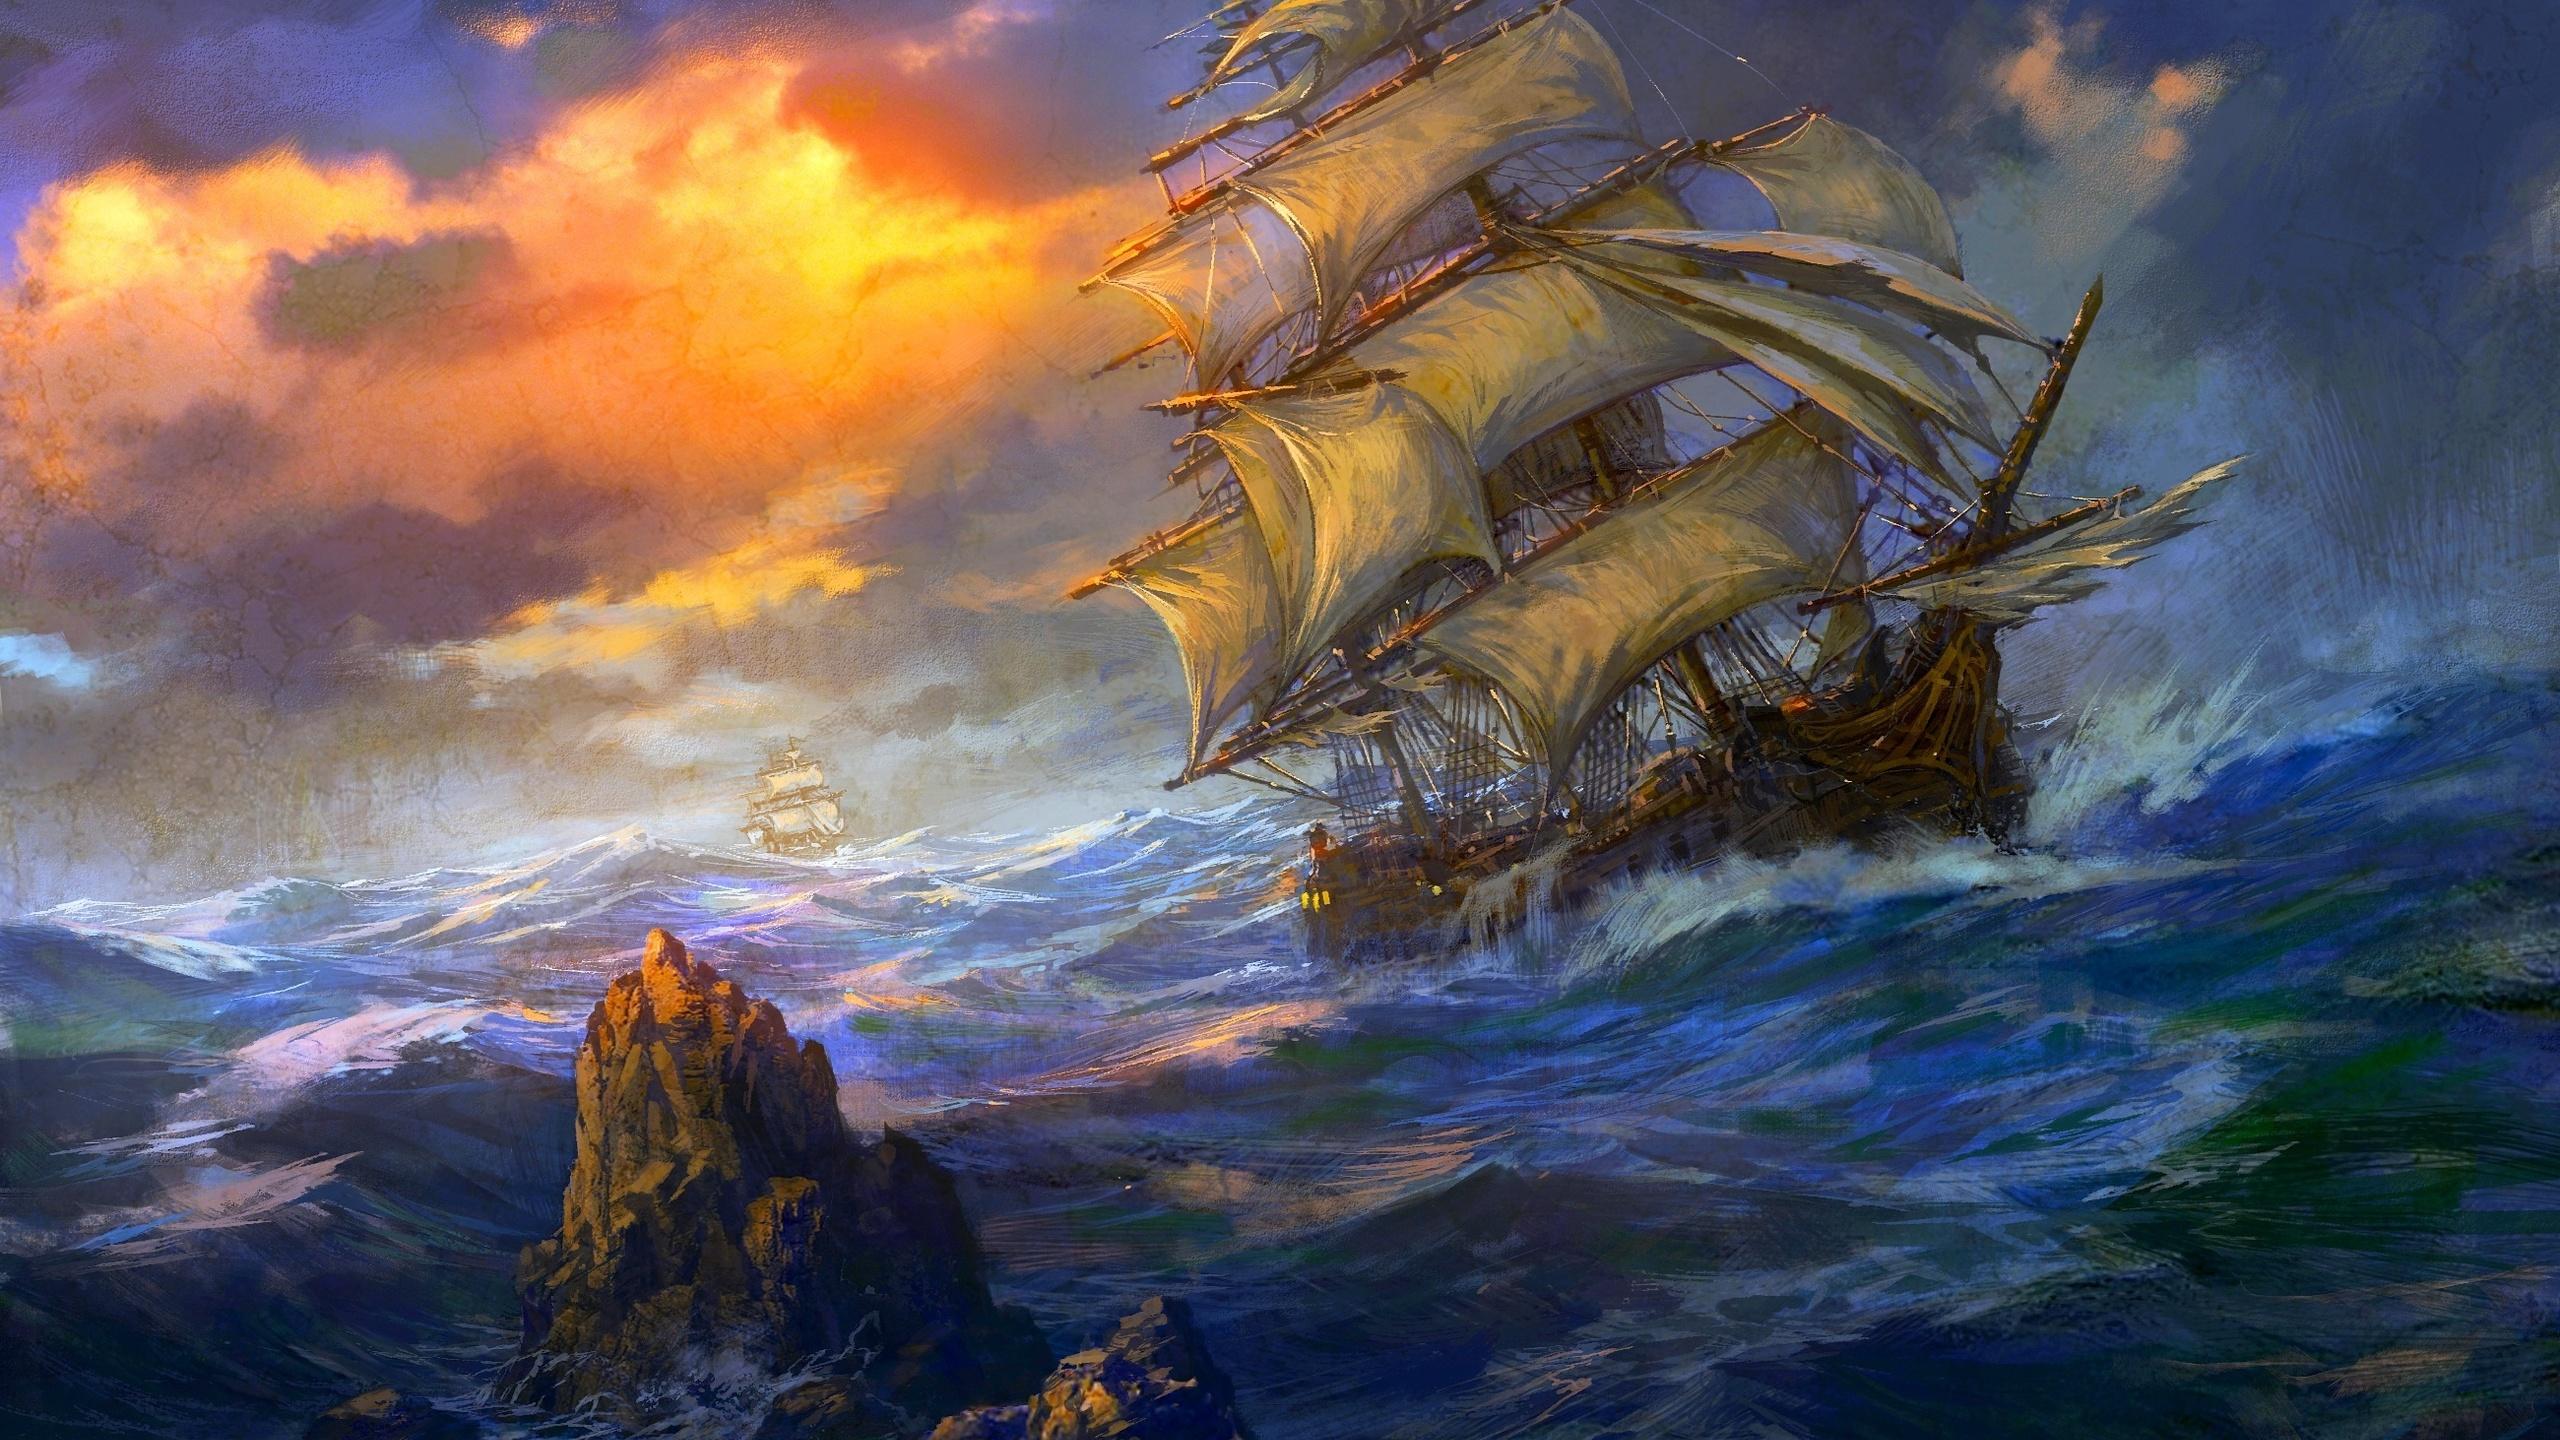 Картинки кораблей на море в шторм